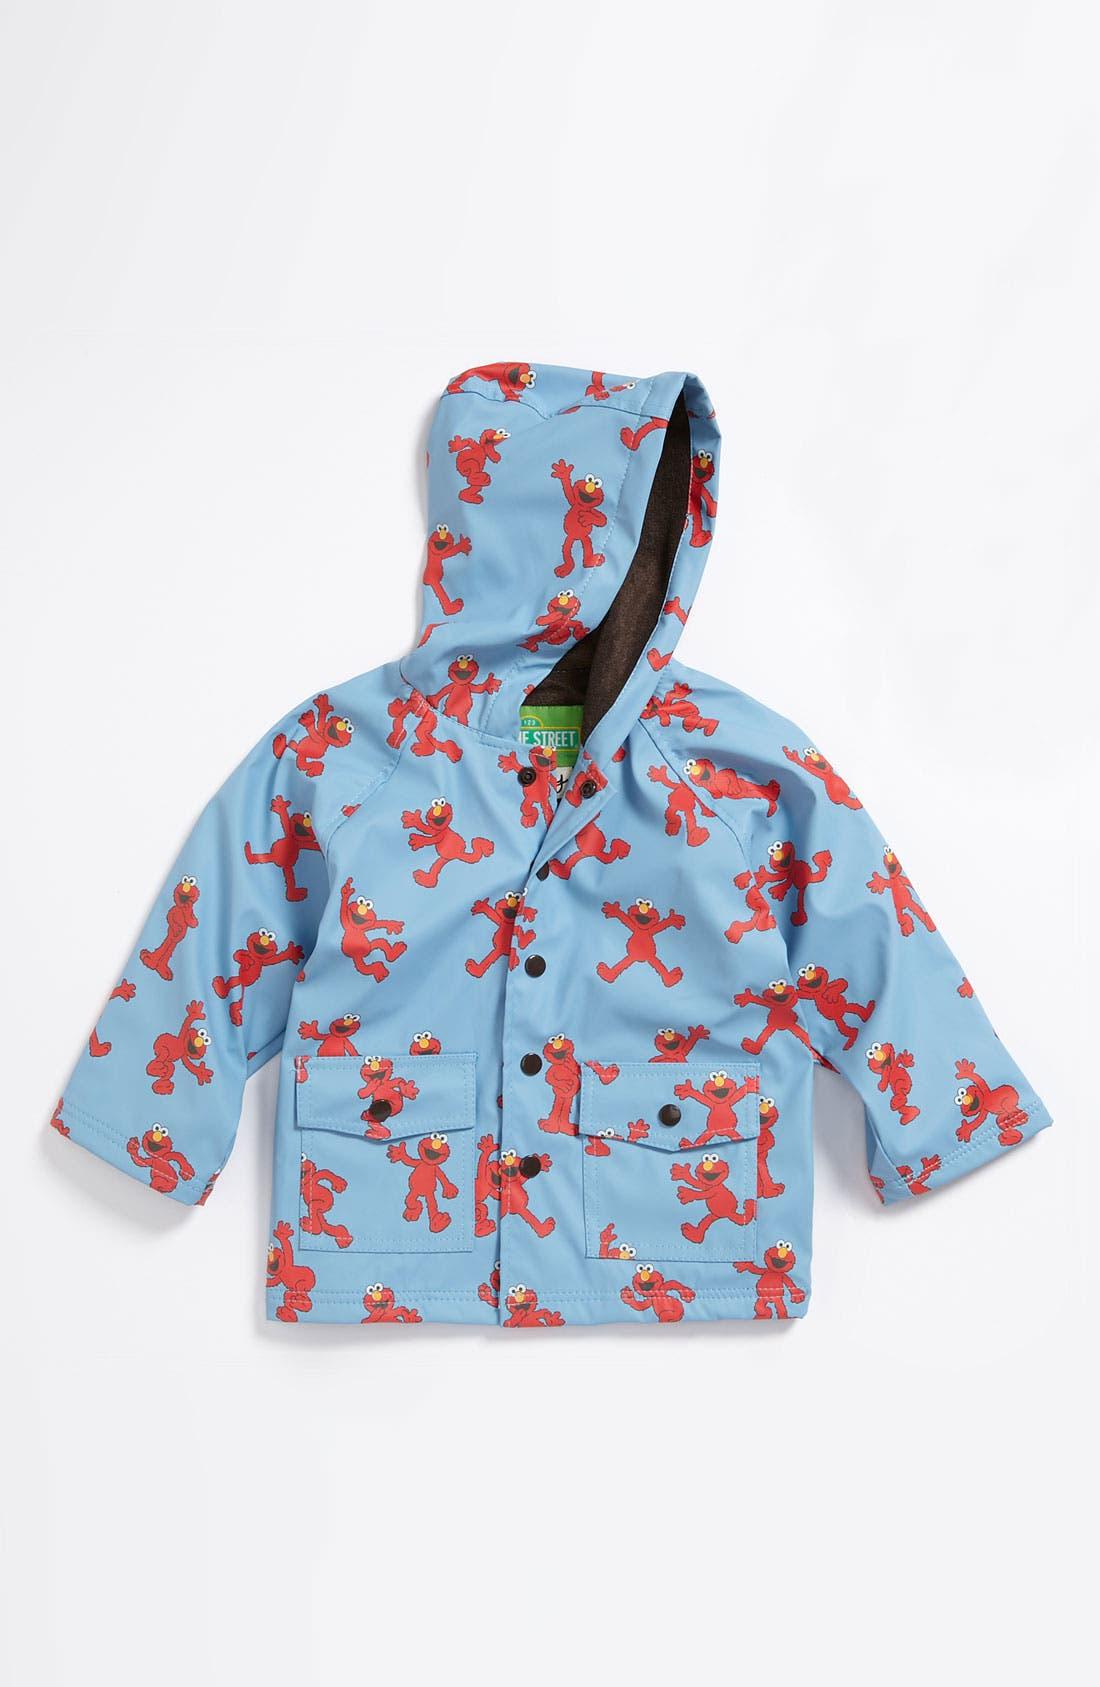 Alternate Image 1 Selected - Hatley 'Sesame Street® - Elmo' Raincoat (Toddler)